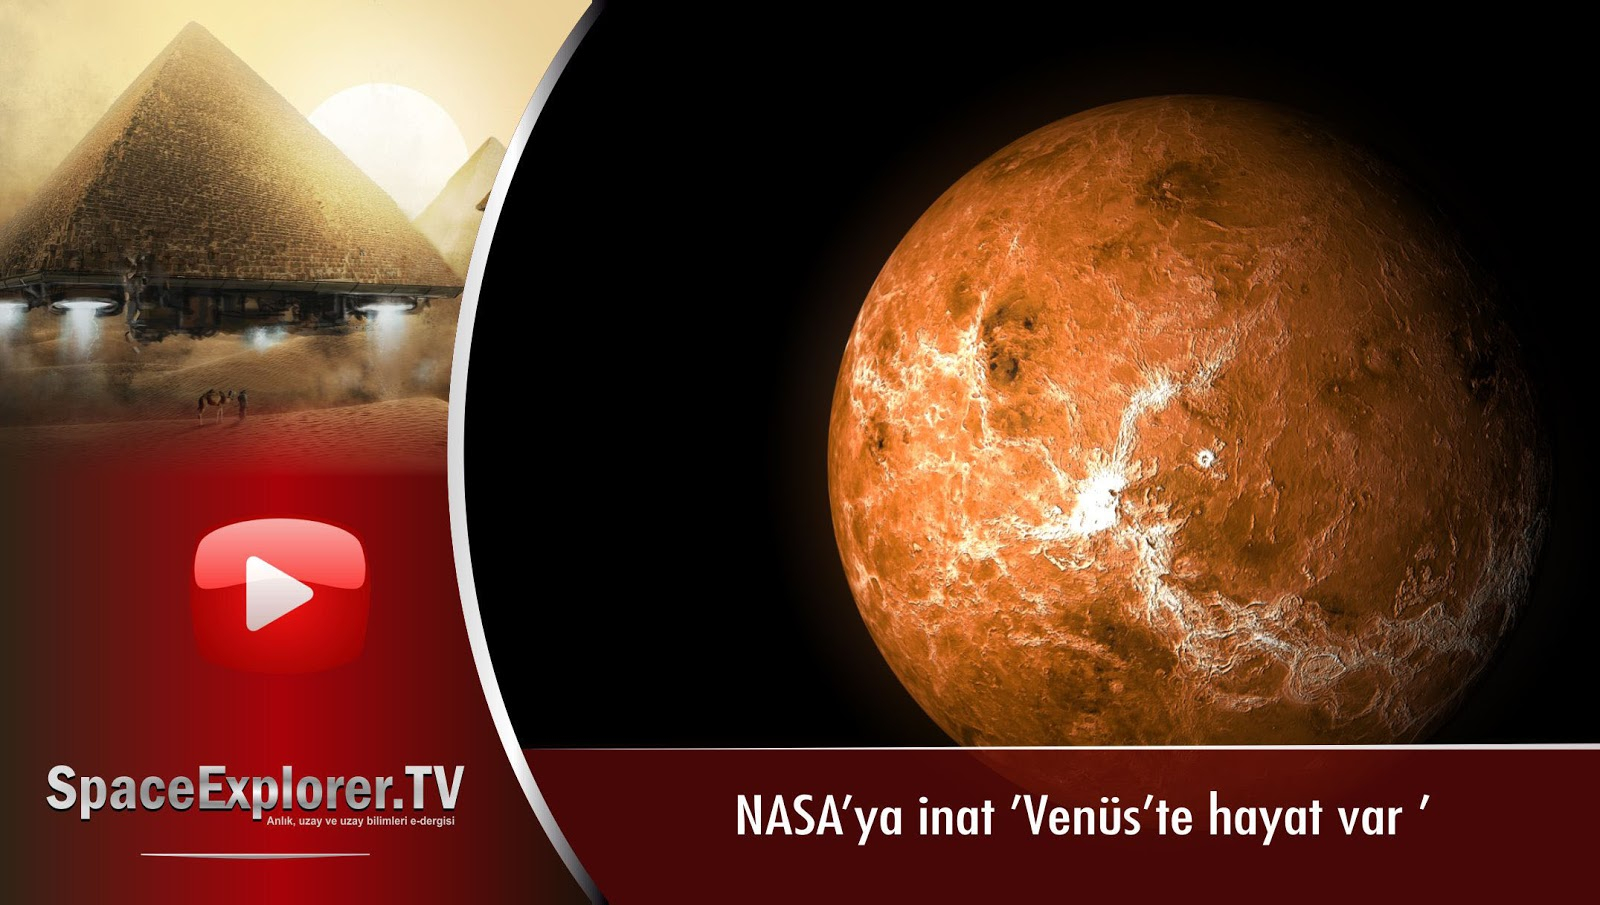 Videolar, Venüs, Venüs'te hayat var mı, Rusya, Rusya uzay araştırmaları, Uzayda hayat var mı?,